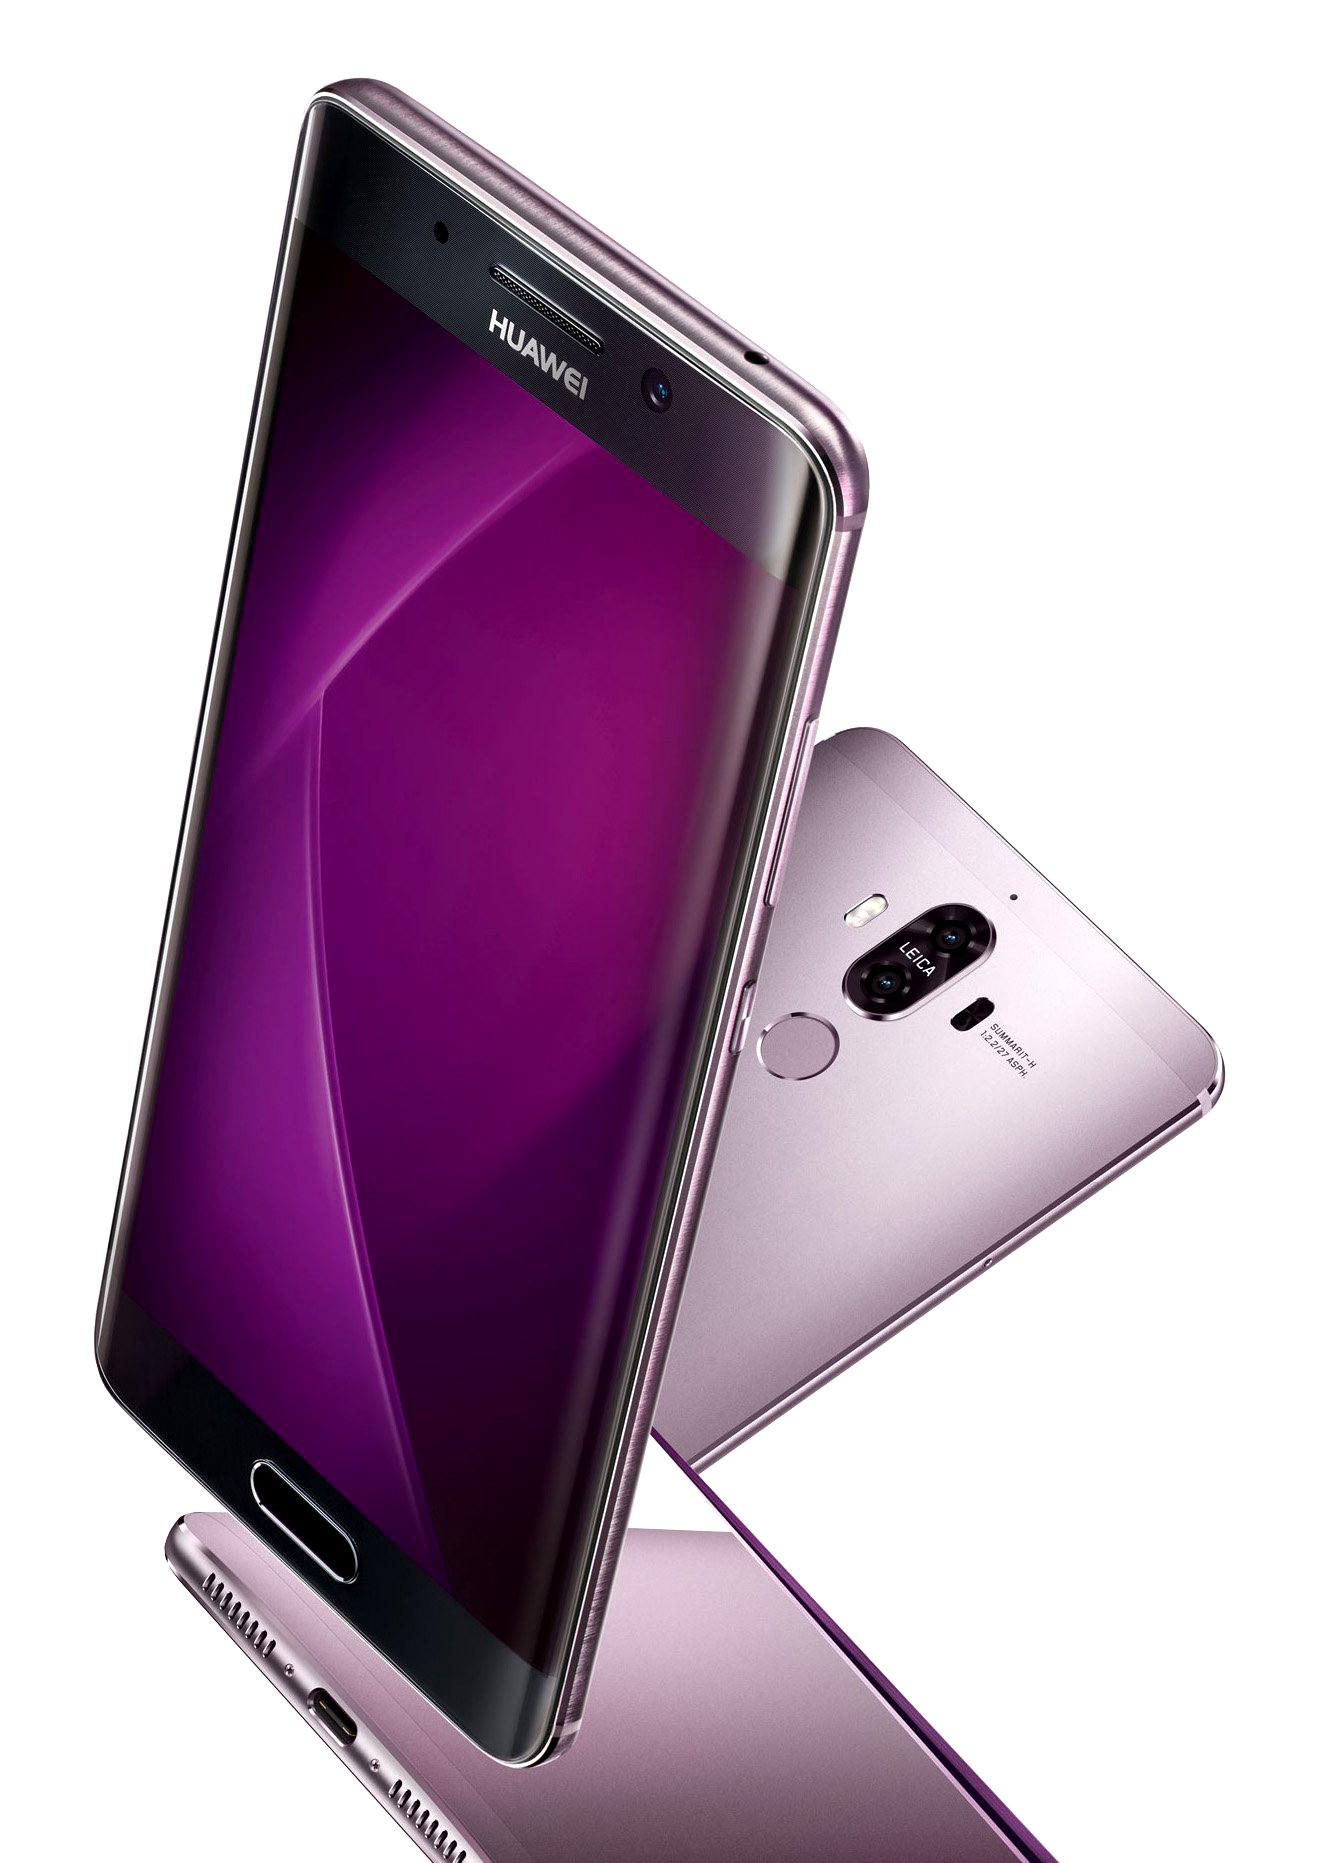 تسريبات: هاتف Mate 9 Pro من هواوي يدعم تكبير بصري 4X